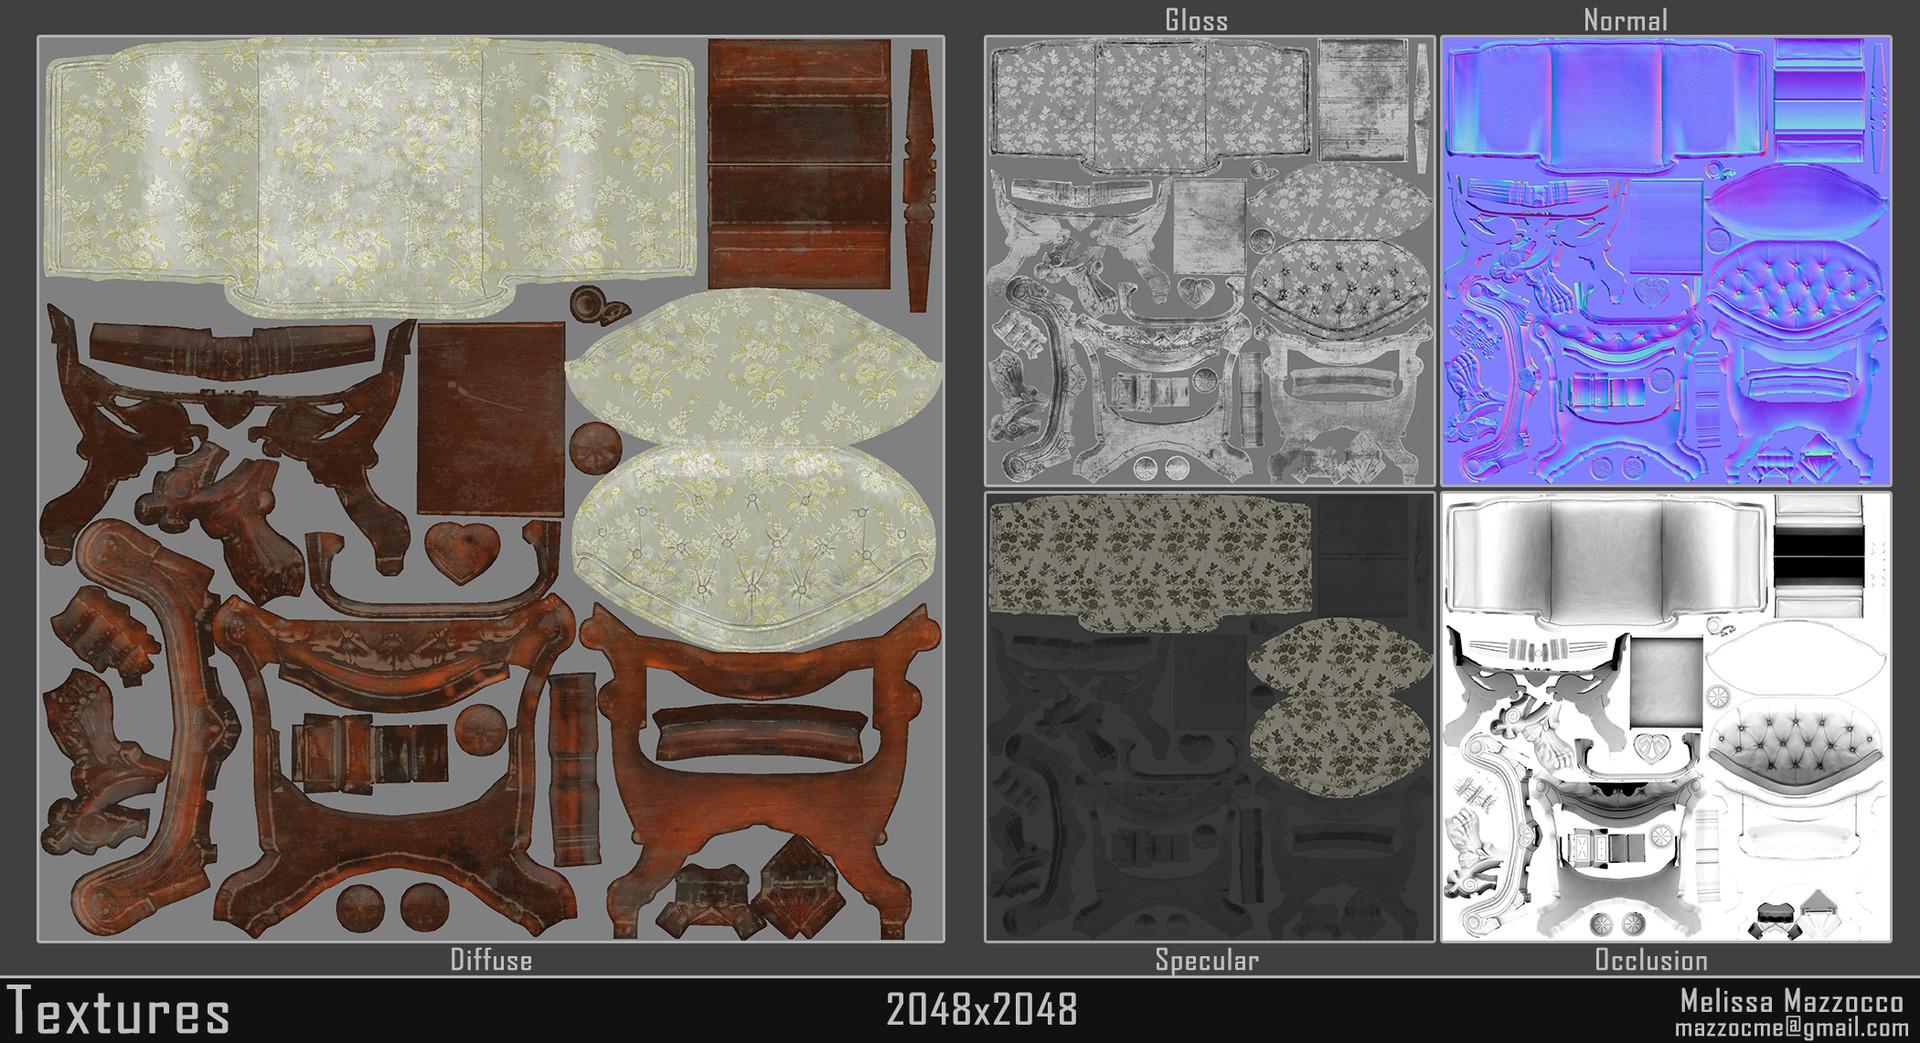 Melissa mazzocco victorian boudoir chair maps